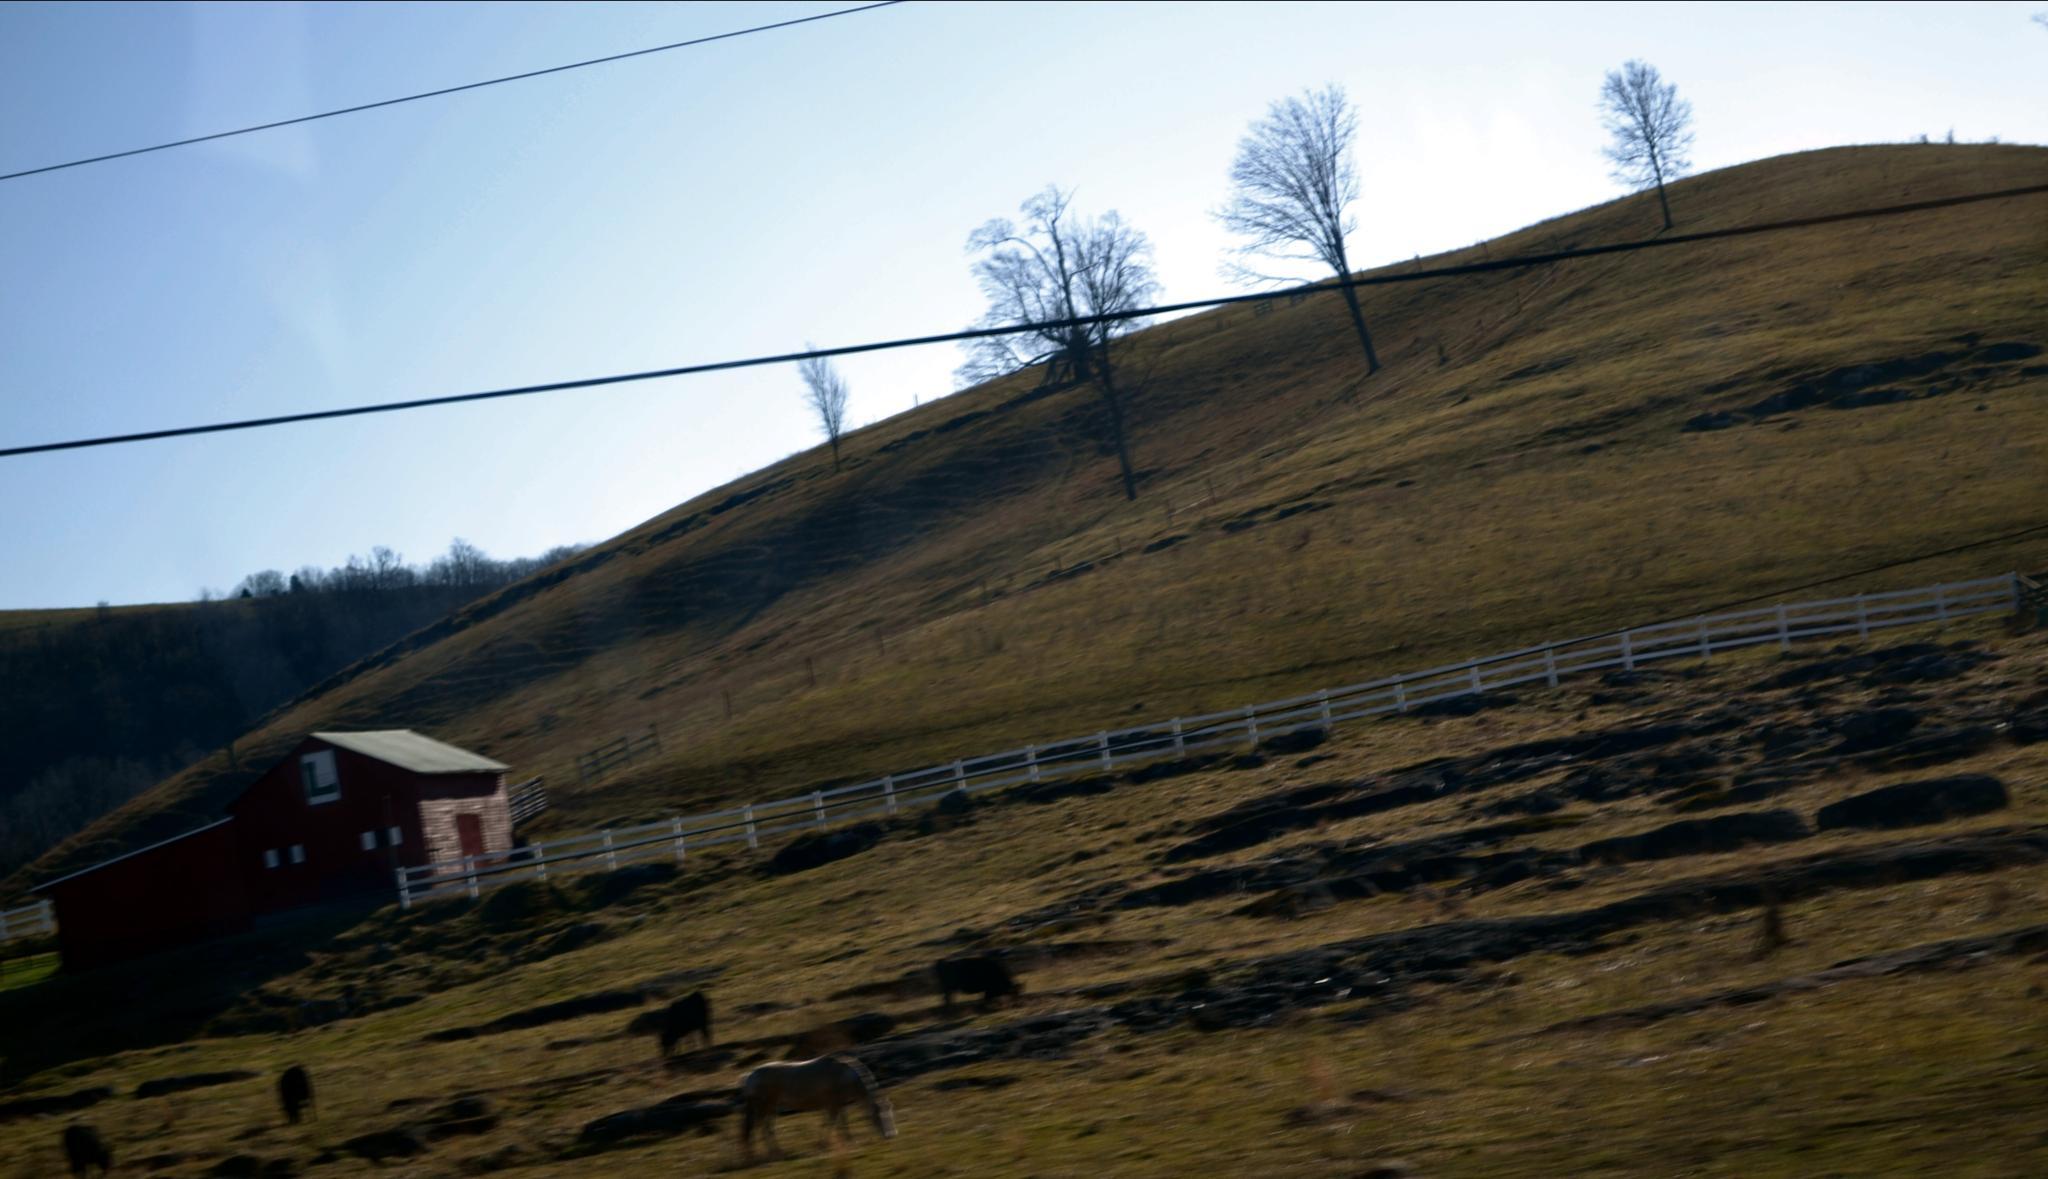 Barn and Horses by lindandarrell